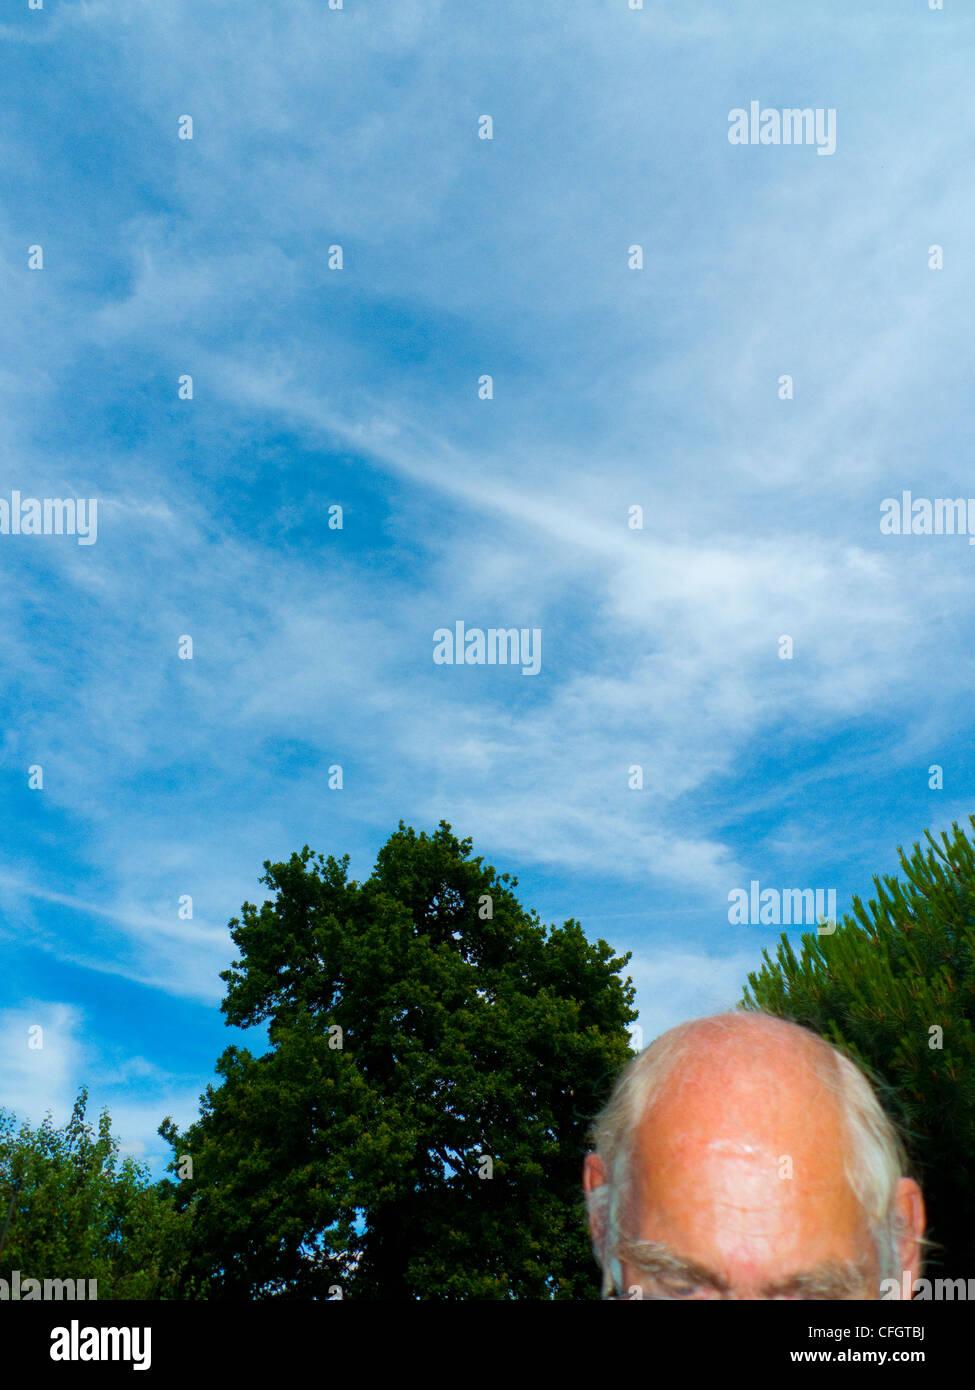 Sunny day, blue sky, elderly man in his back garden, Portrait format - Stock Image